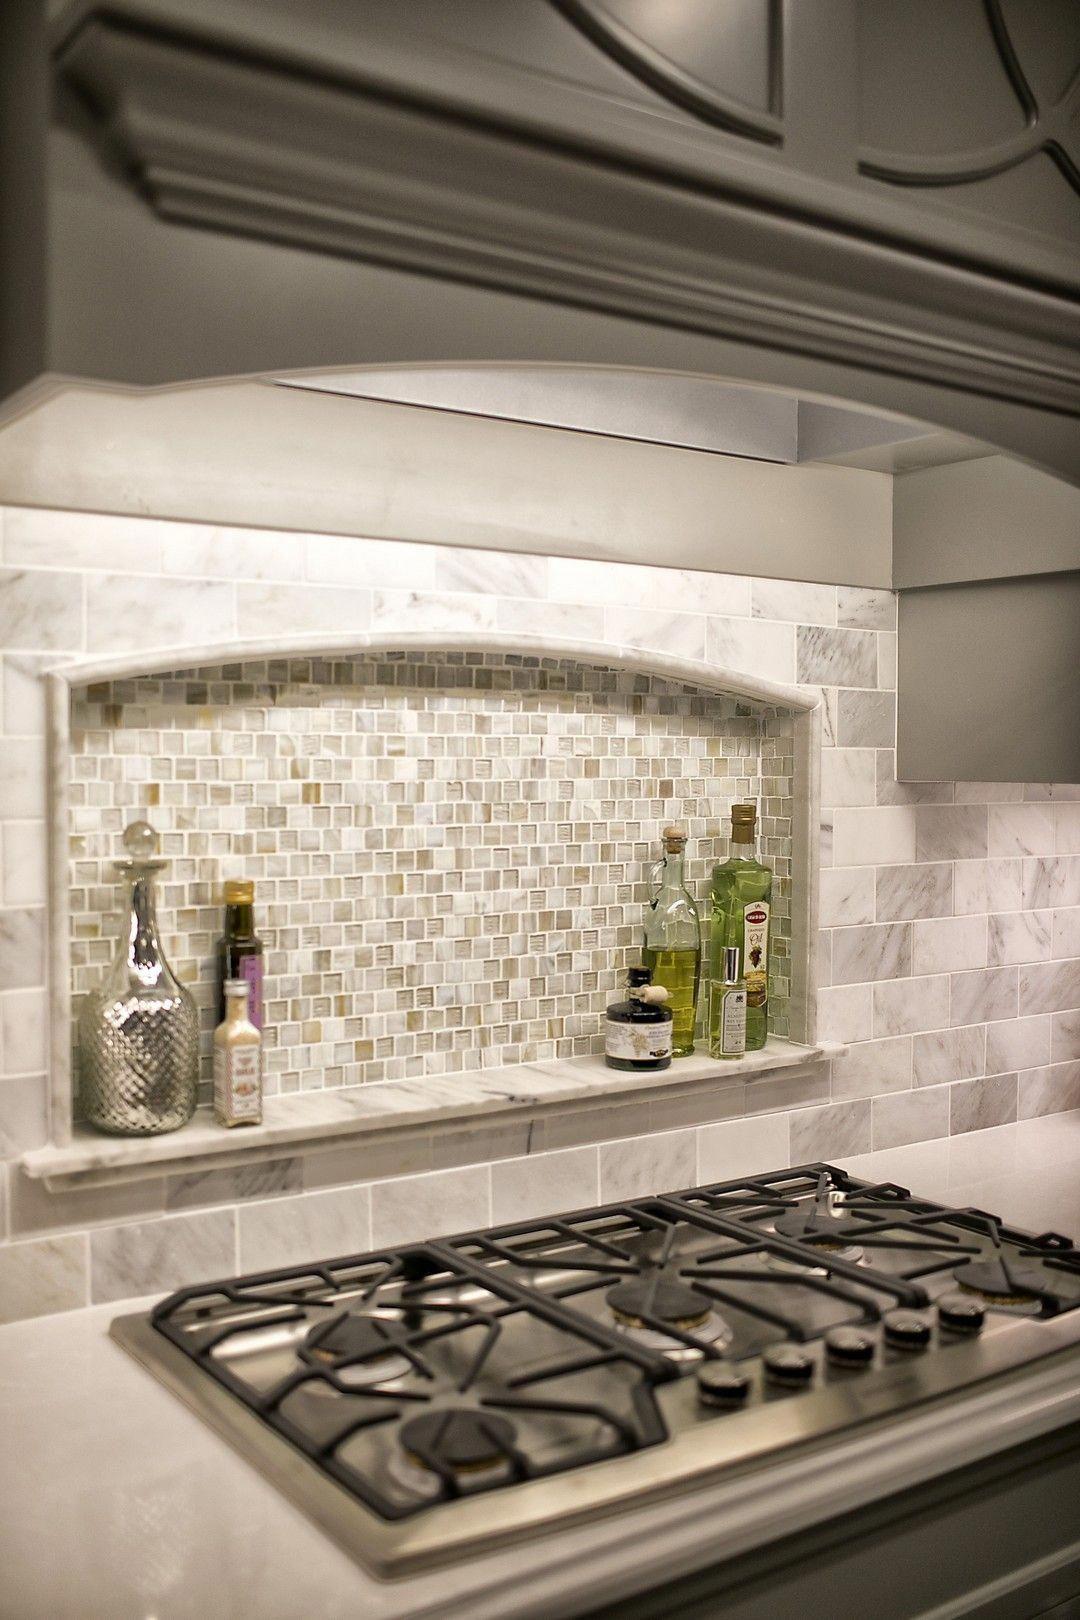 - PRICES FOR THE DEVELOPMENT OF A BASEMENT Kitchen Backsplash